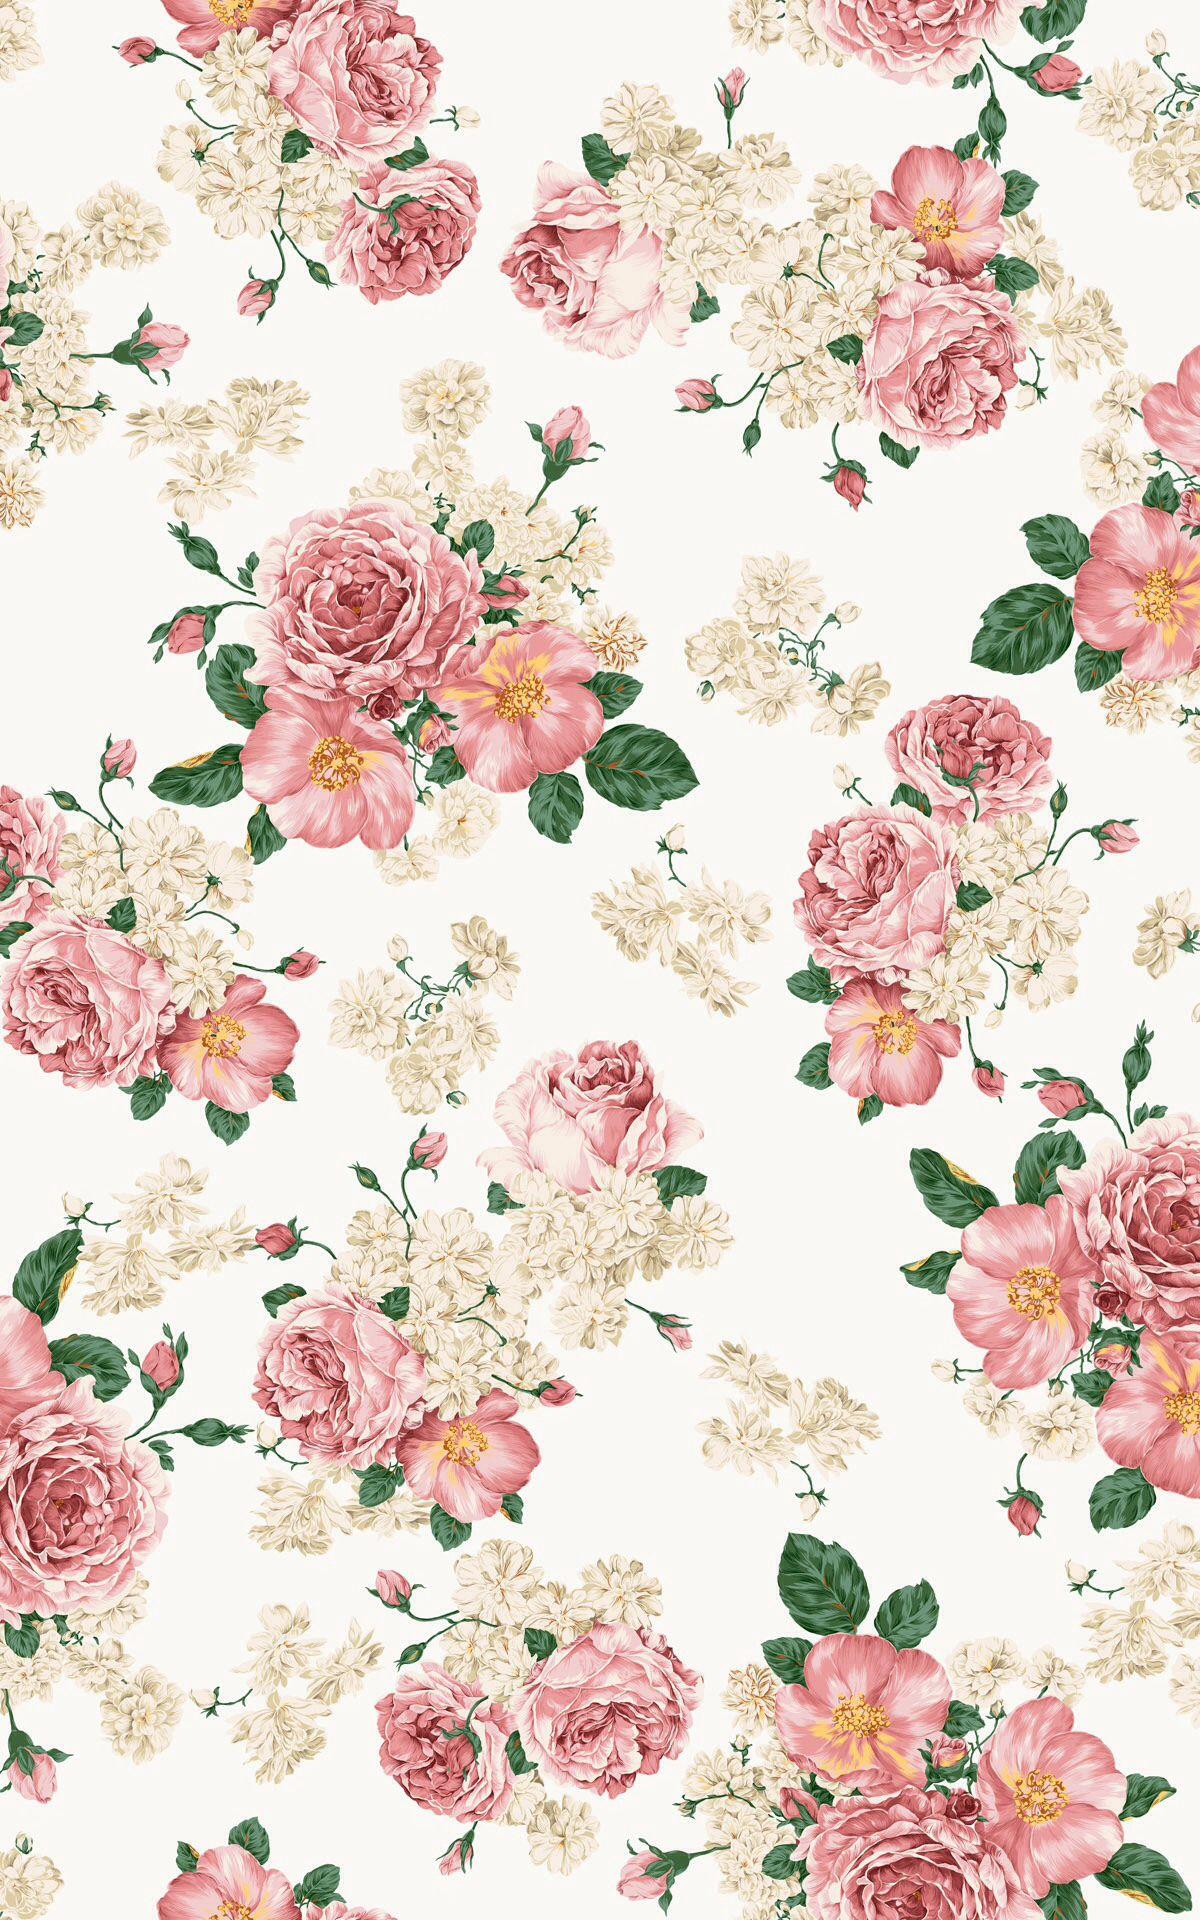 Floral Wallpaper Iphone Floral Wallpaper Iphone Floral Print Wallpaper Vintage Floral Wallpapers